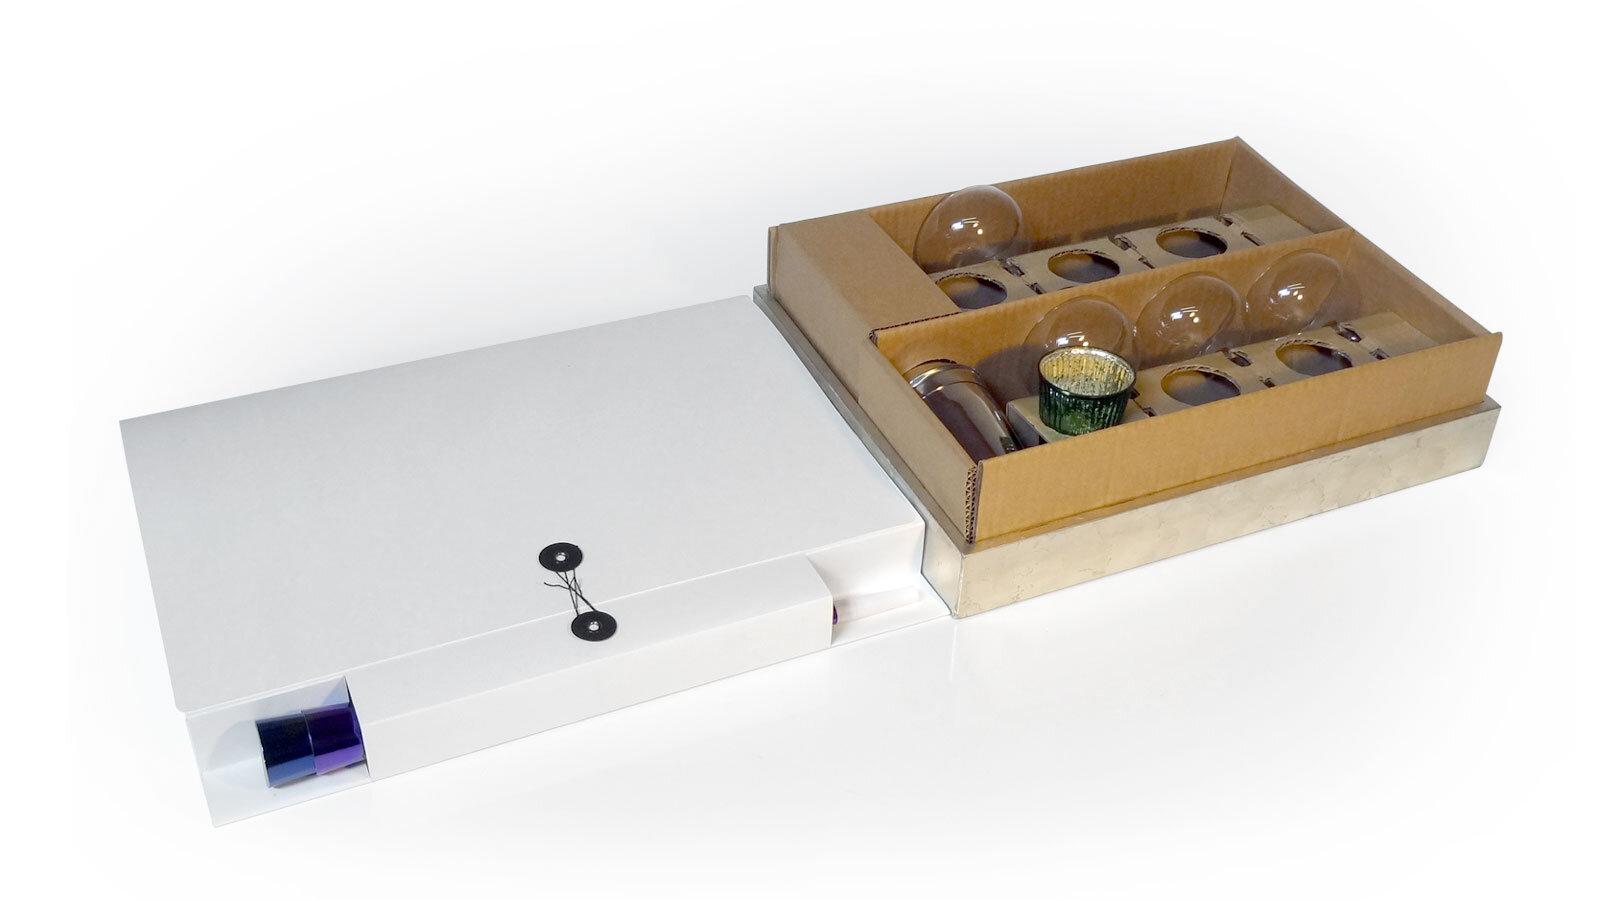 West-Elm-Box-Packaging-Company-Design-4.JPG